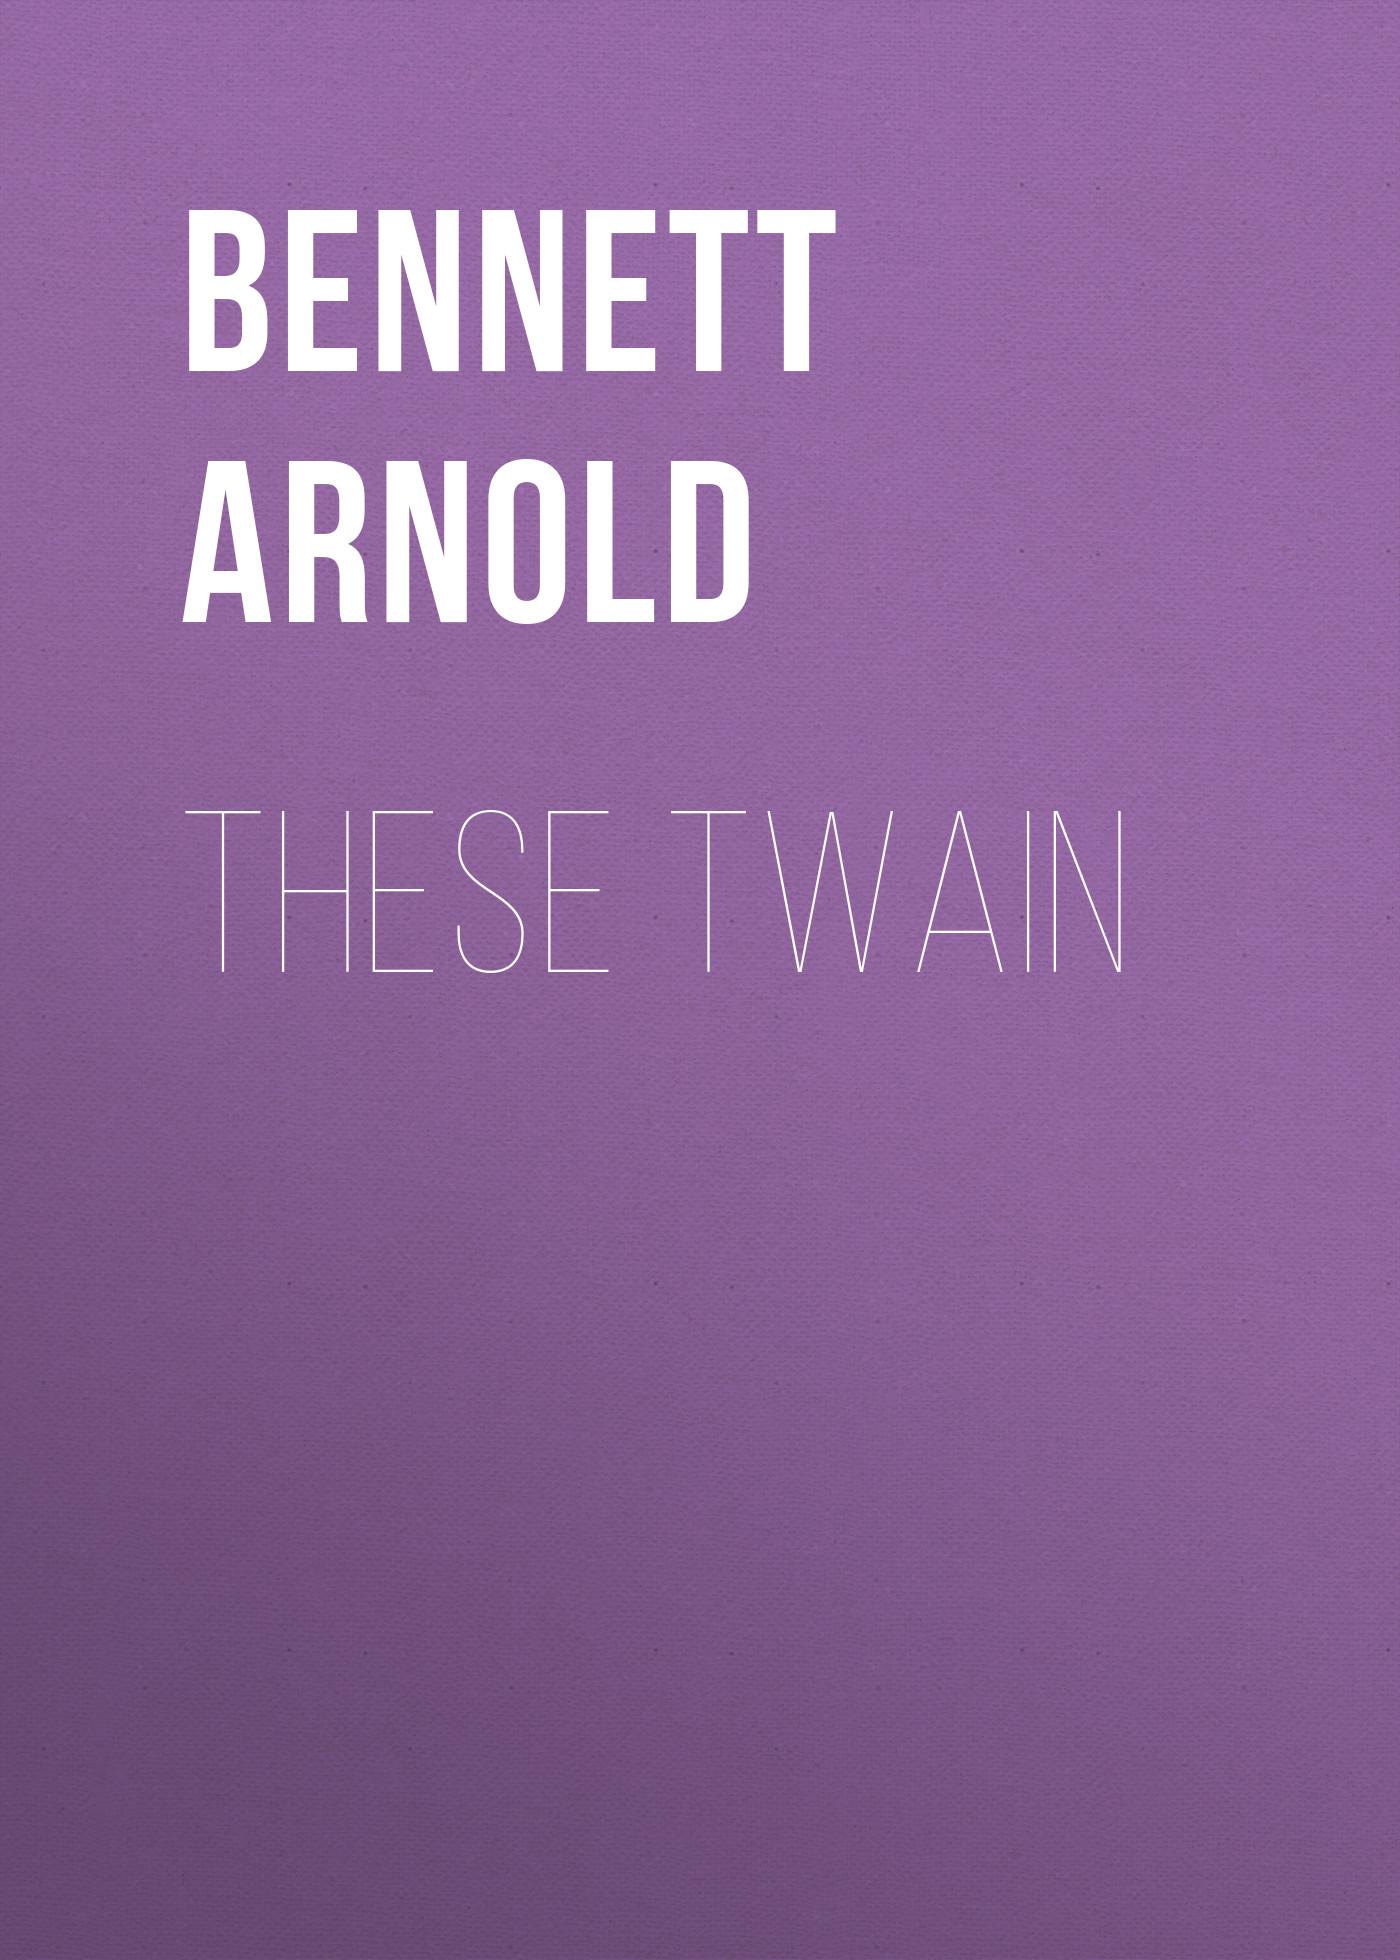 Bennett Arnold These Twain shania twain shania twain up red 2 lp